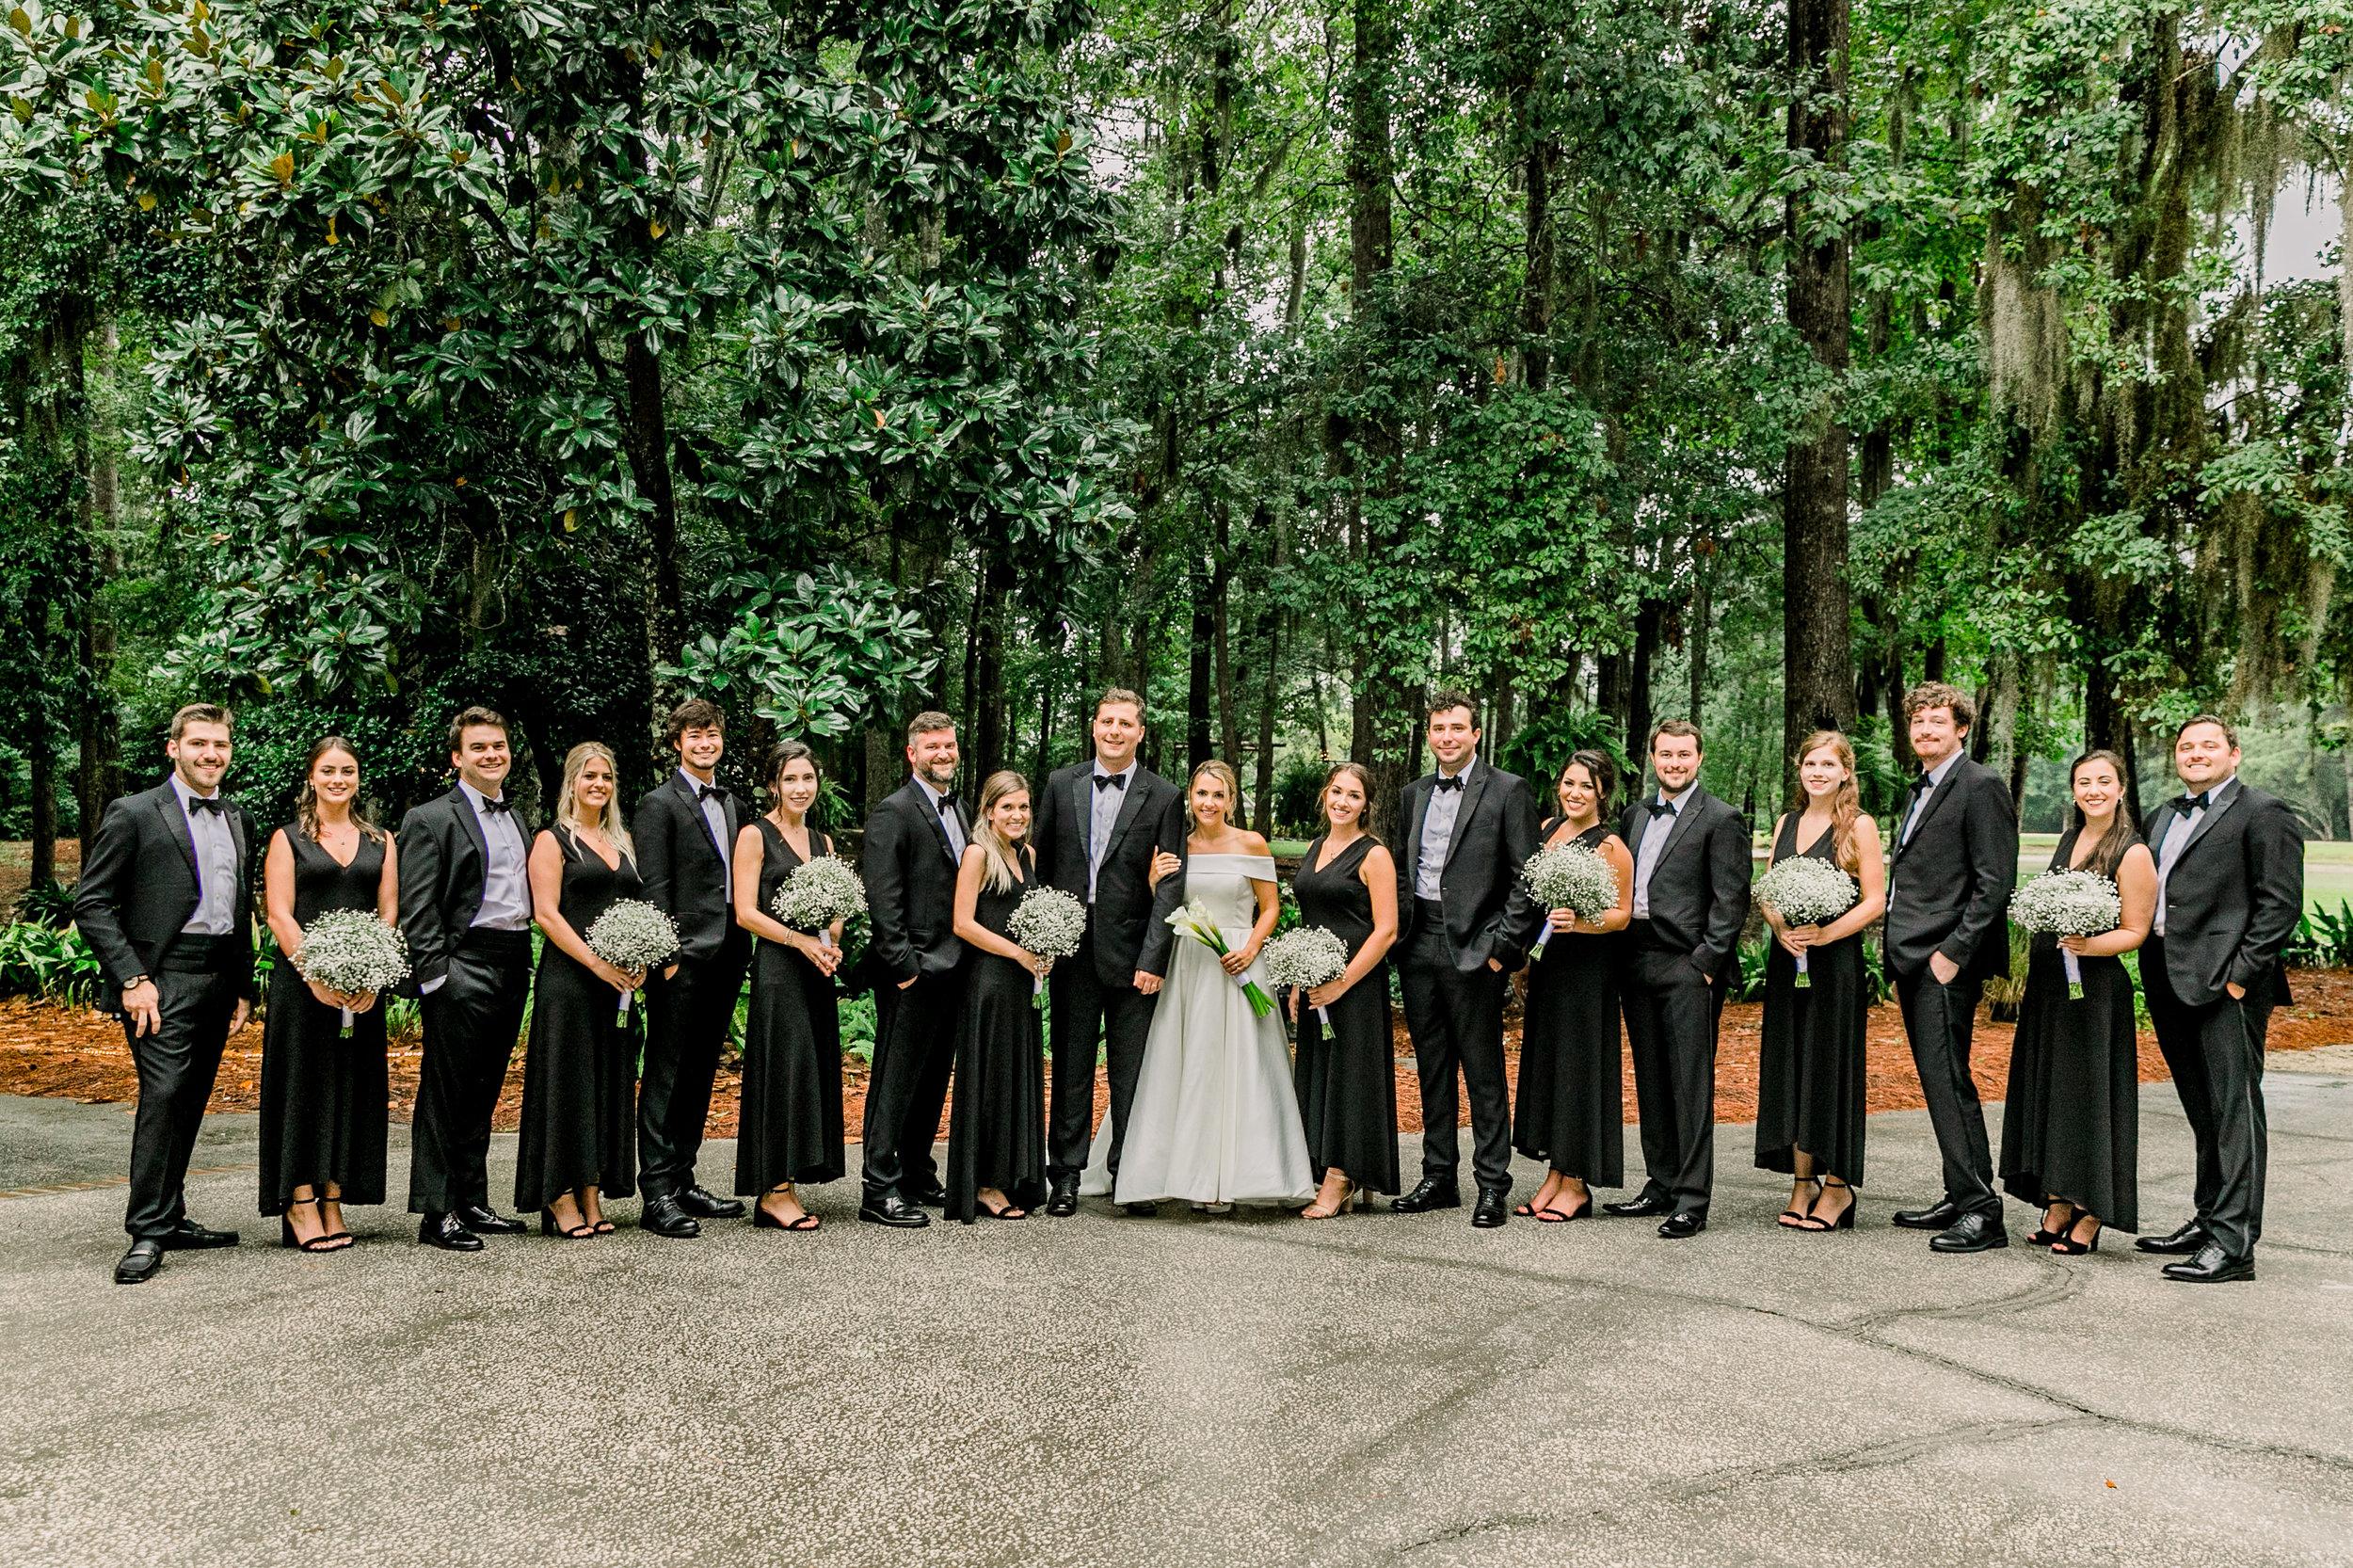 Edgemon Wedding 09425-2.jpg